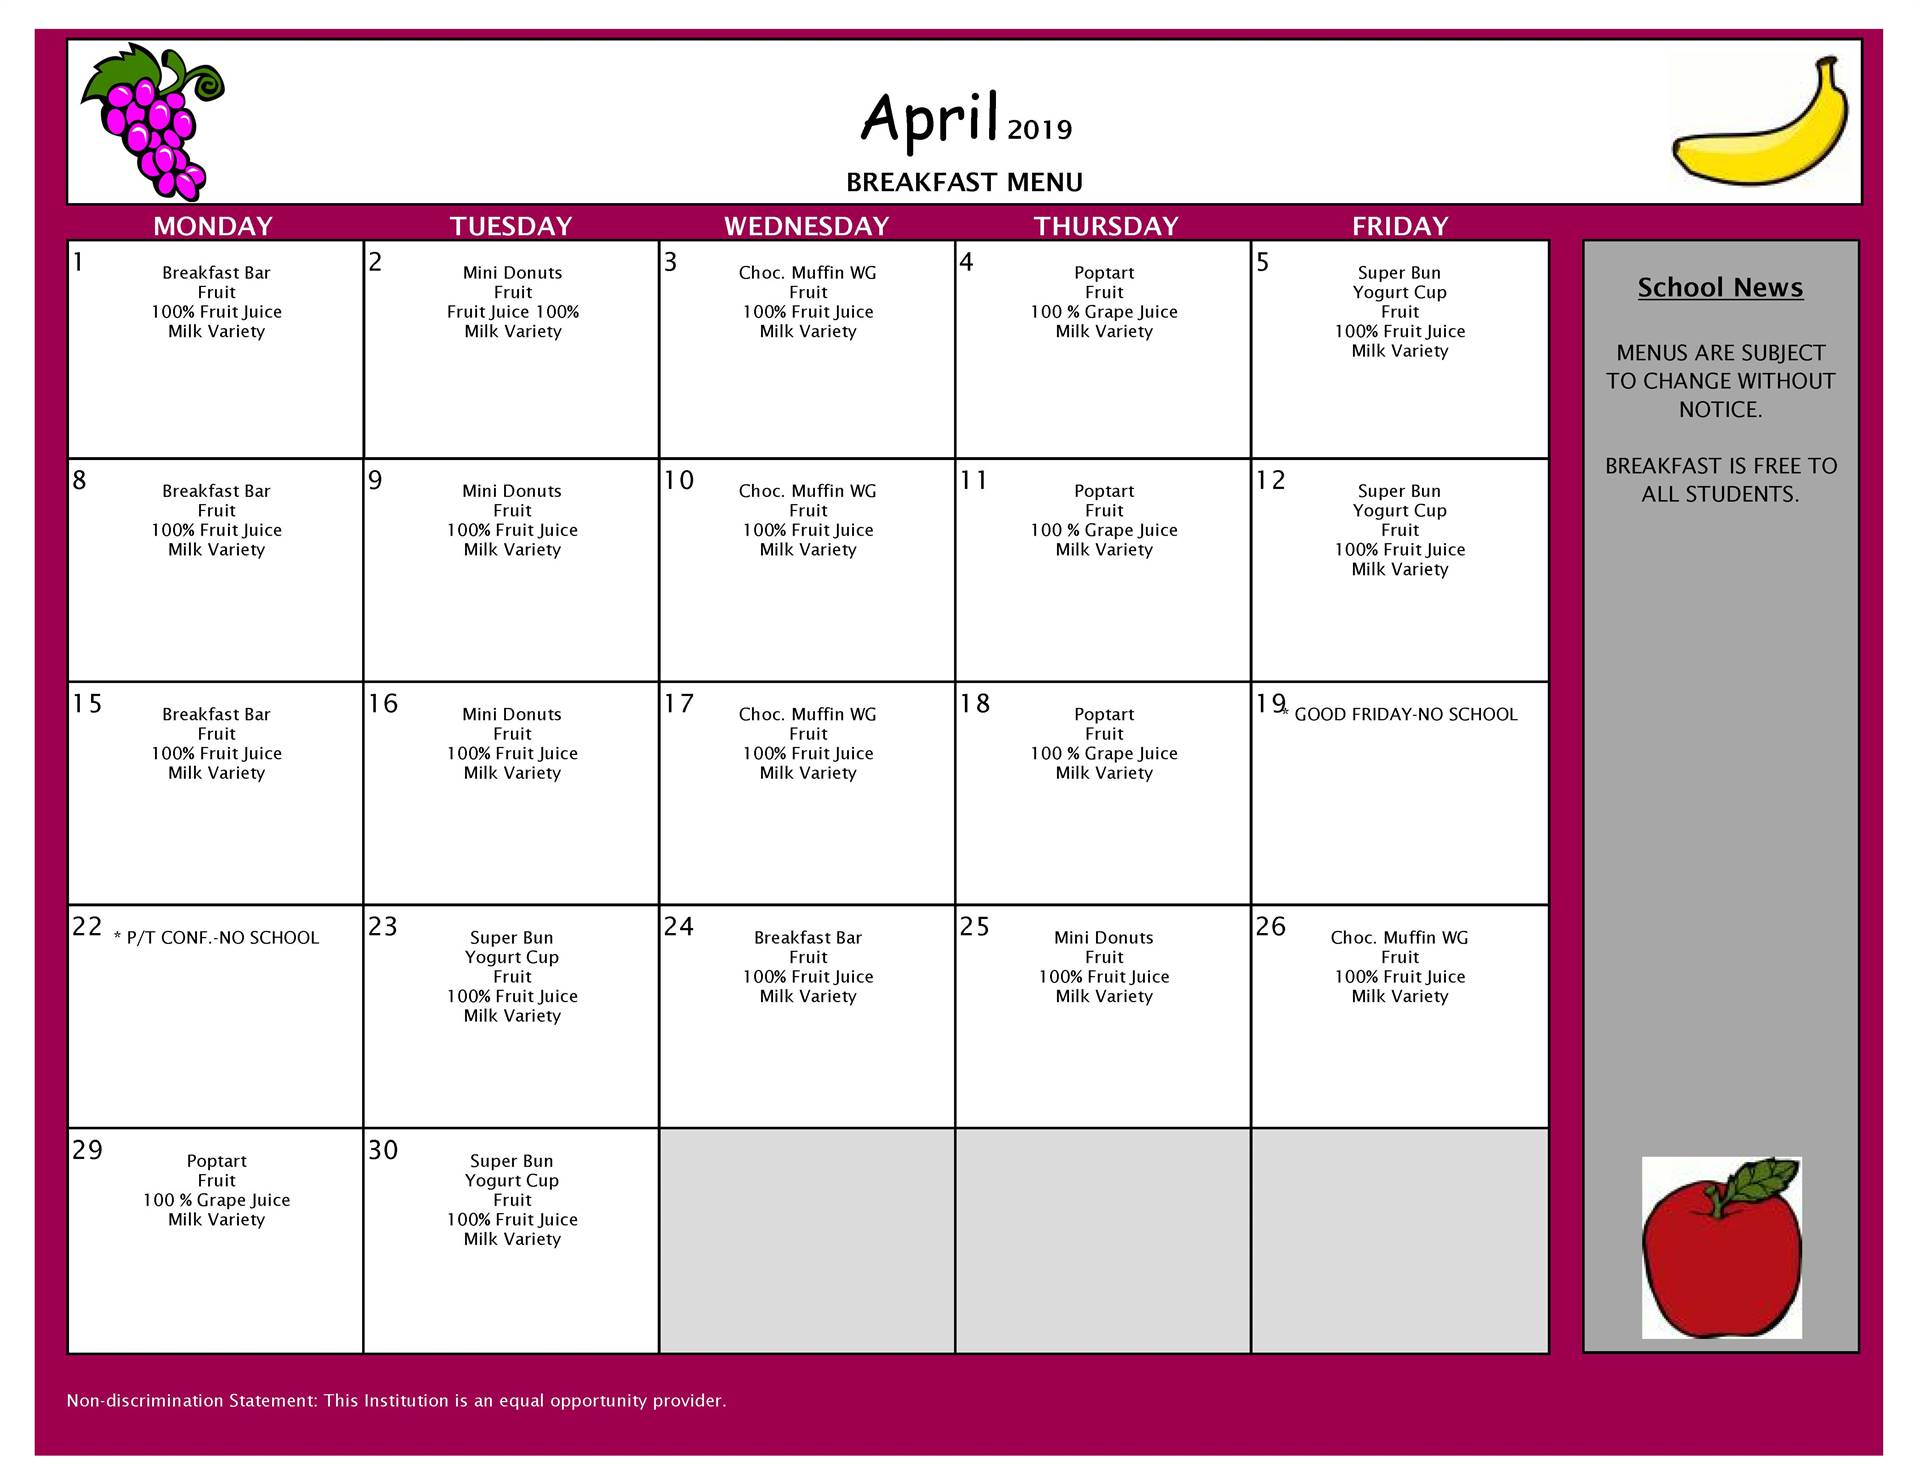 April Breakfast Menu Grades 9-12